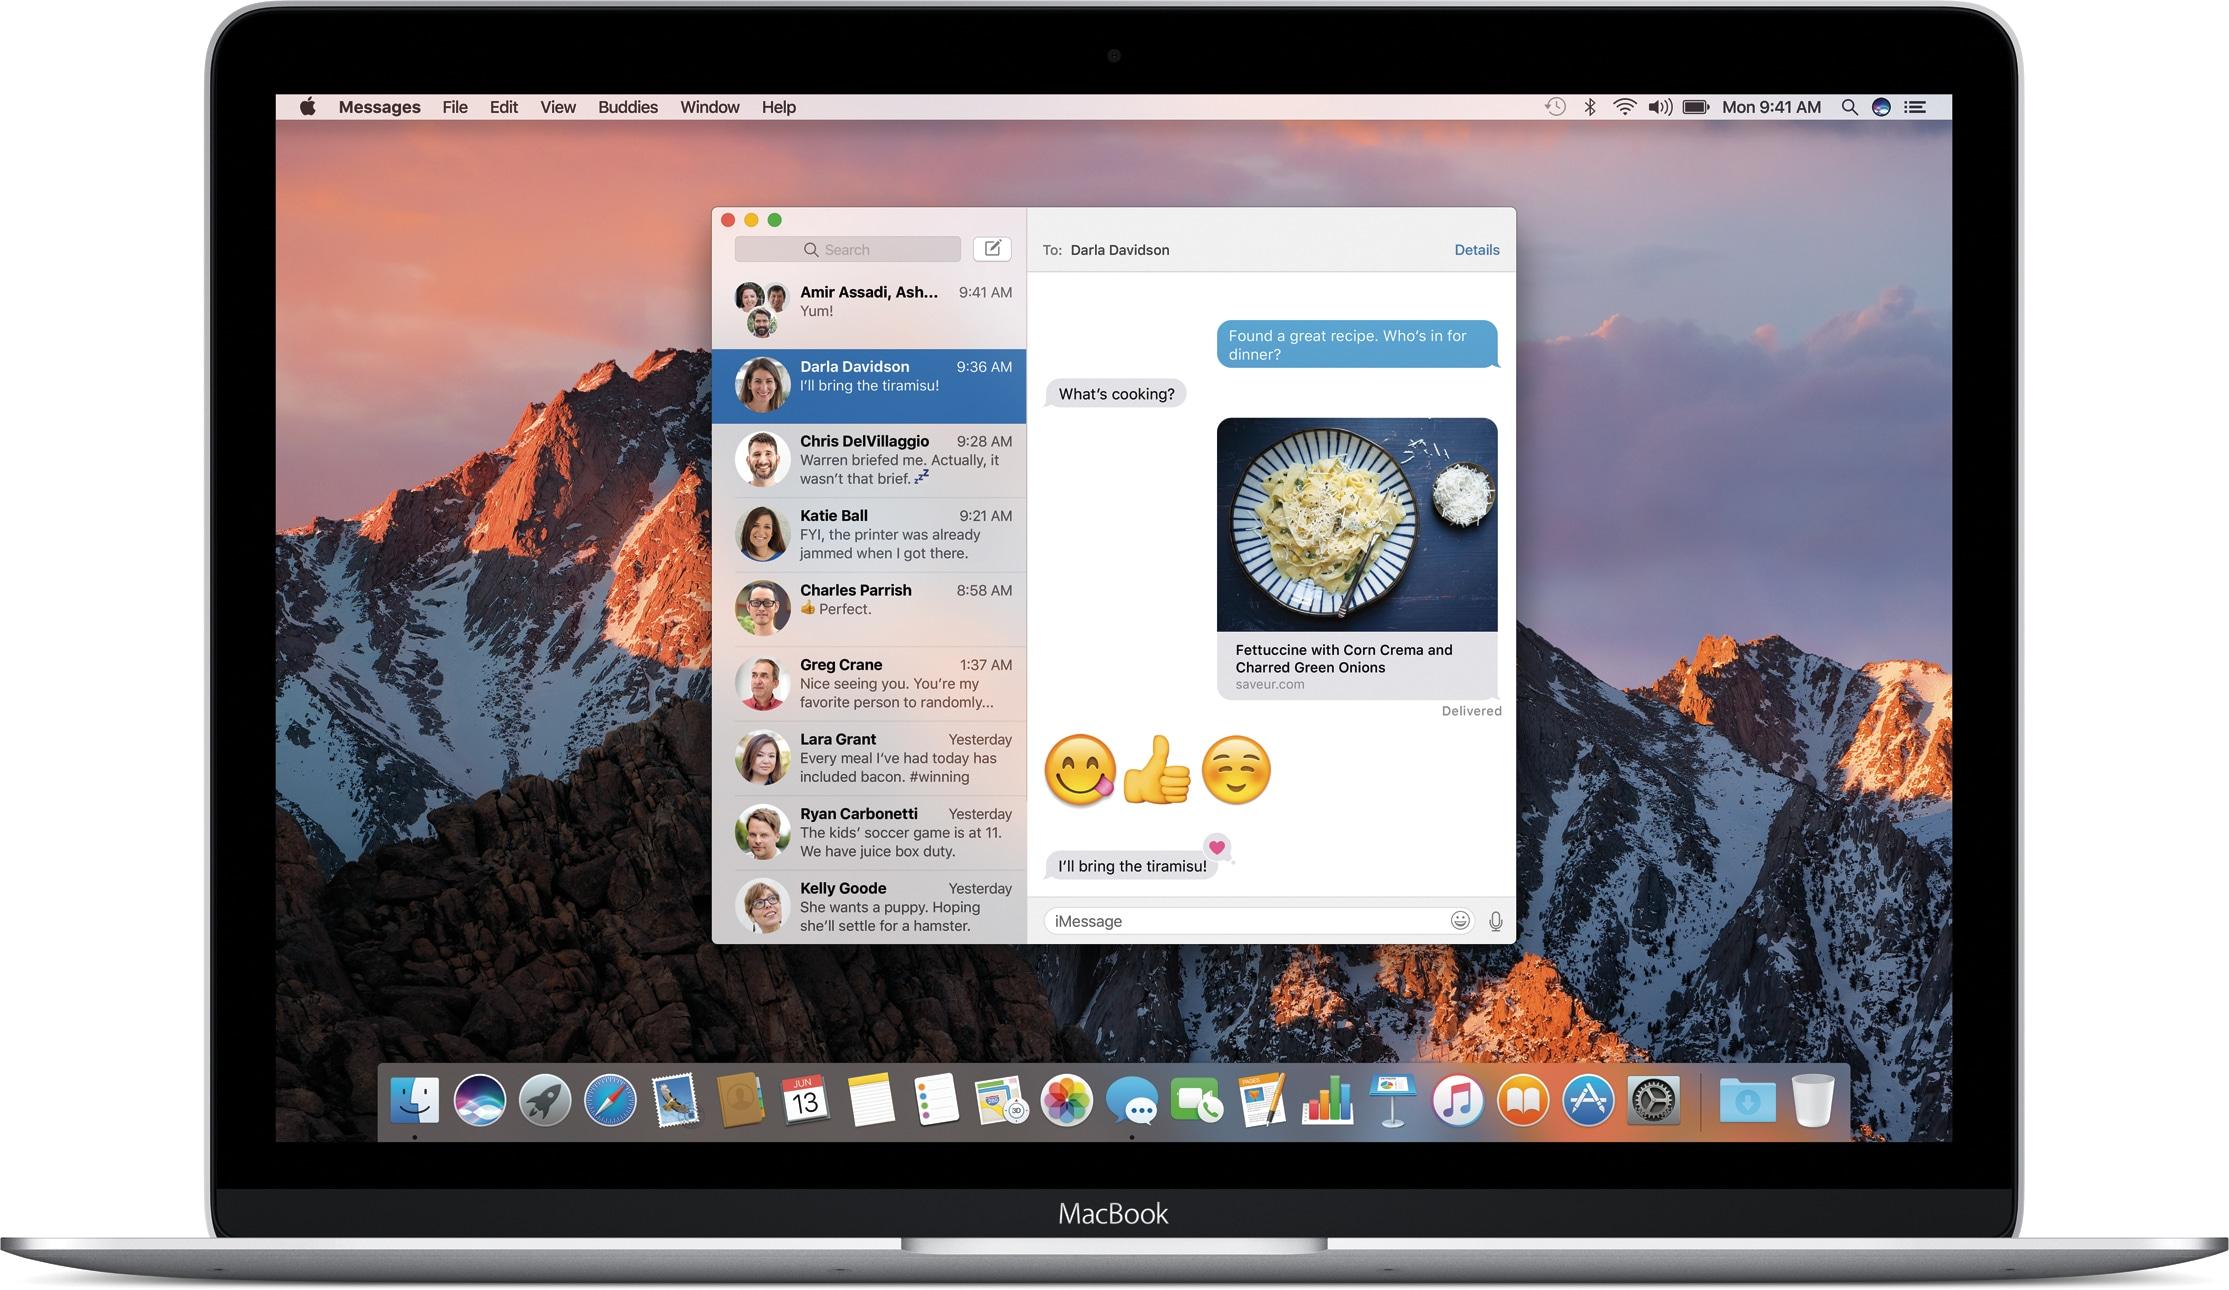 Mensagens do macOS Sierra num MacBook